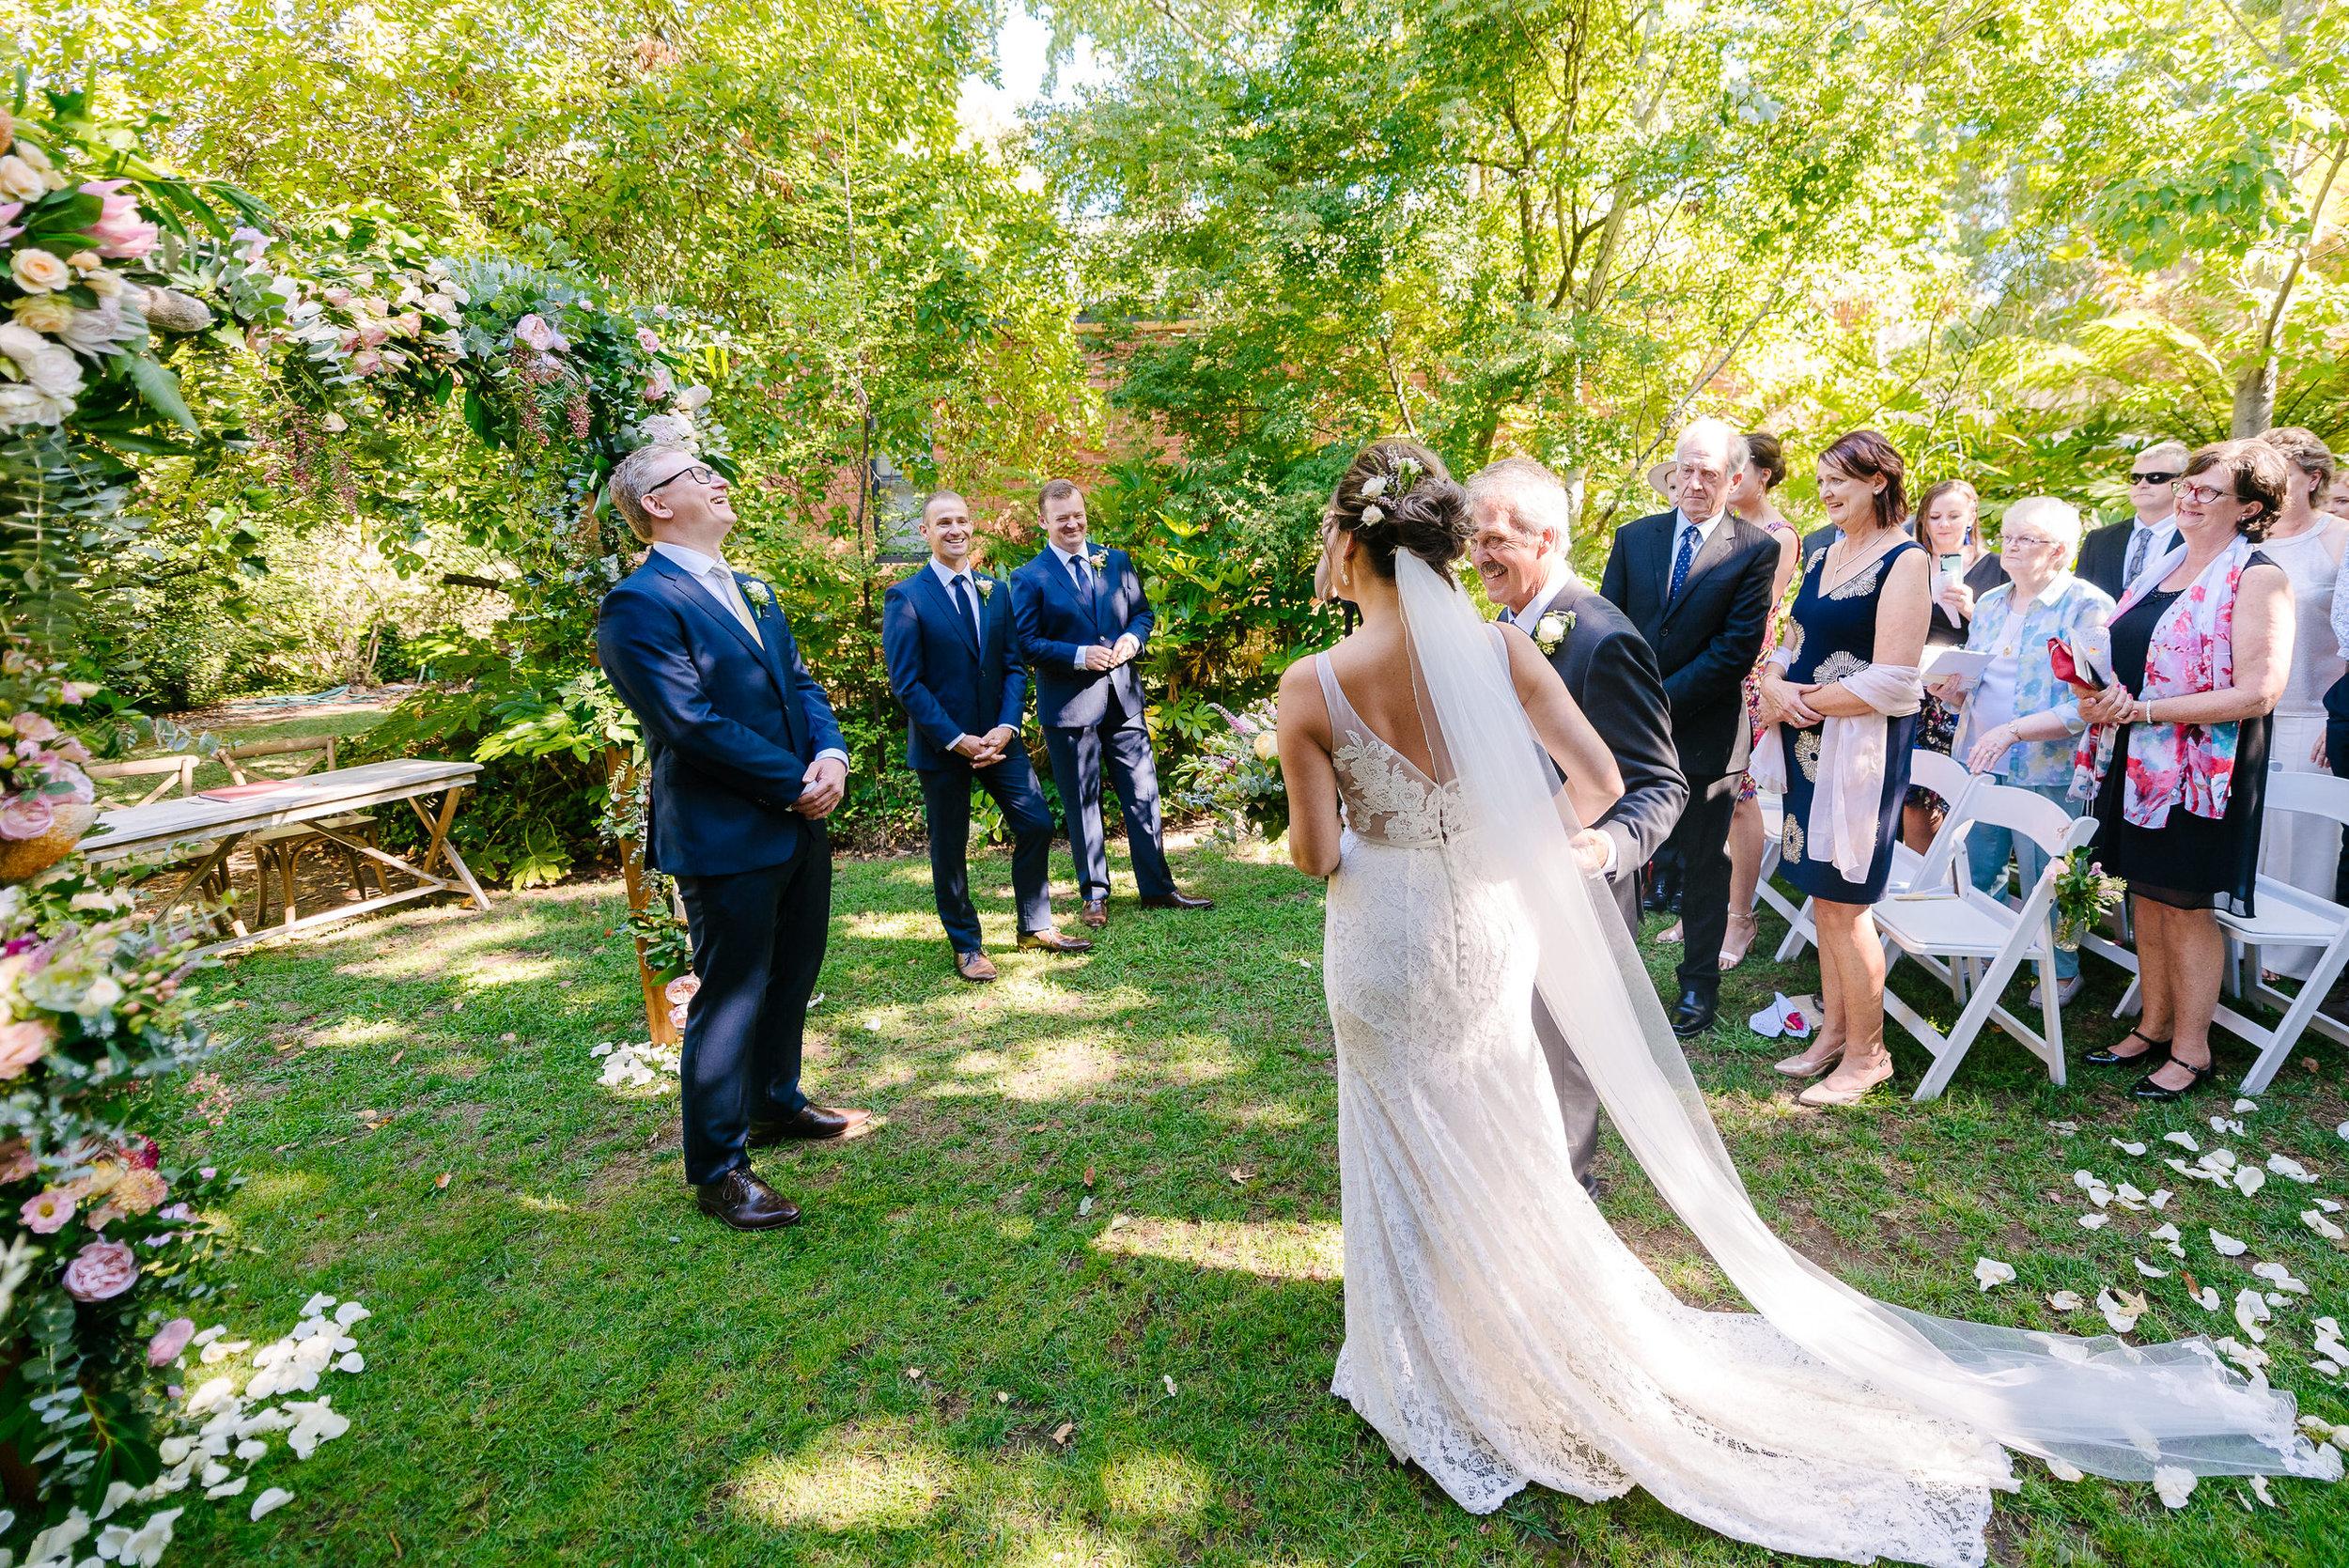 Justin_And_Jim_Photography_Chateau_Dore_Bendigo_Wedding32.JPG